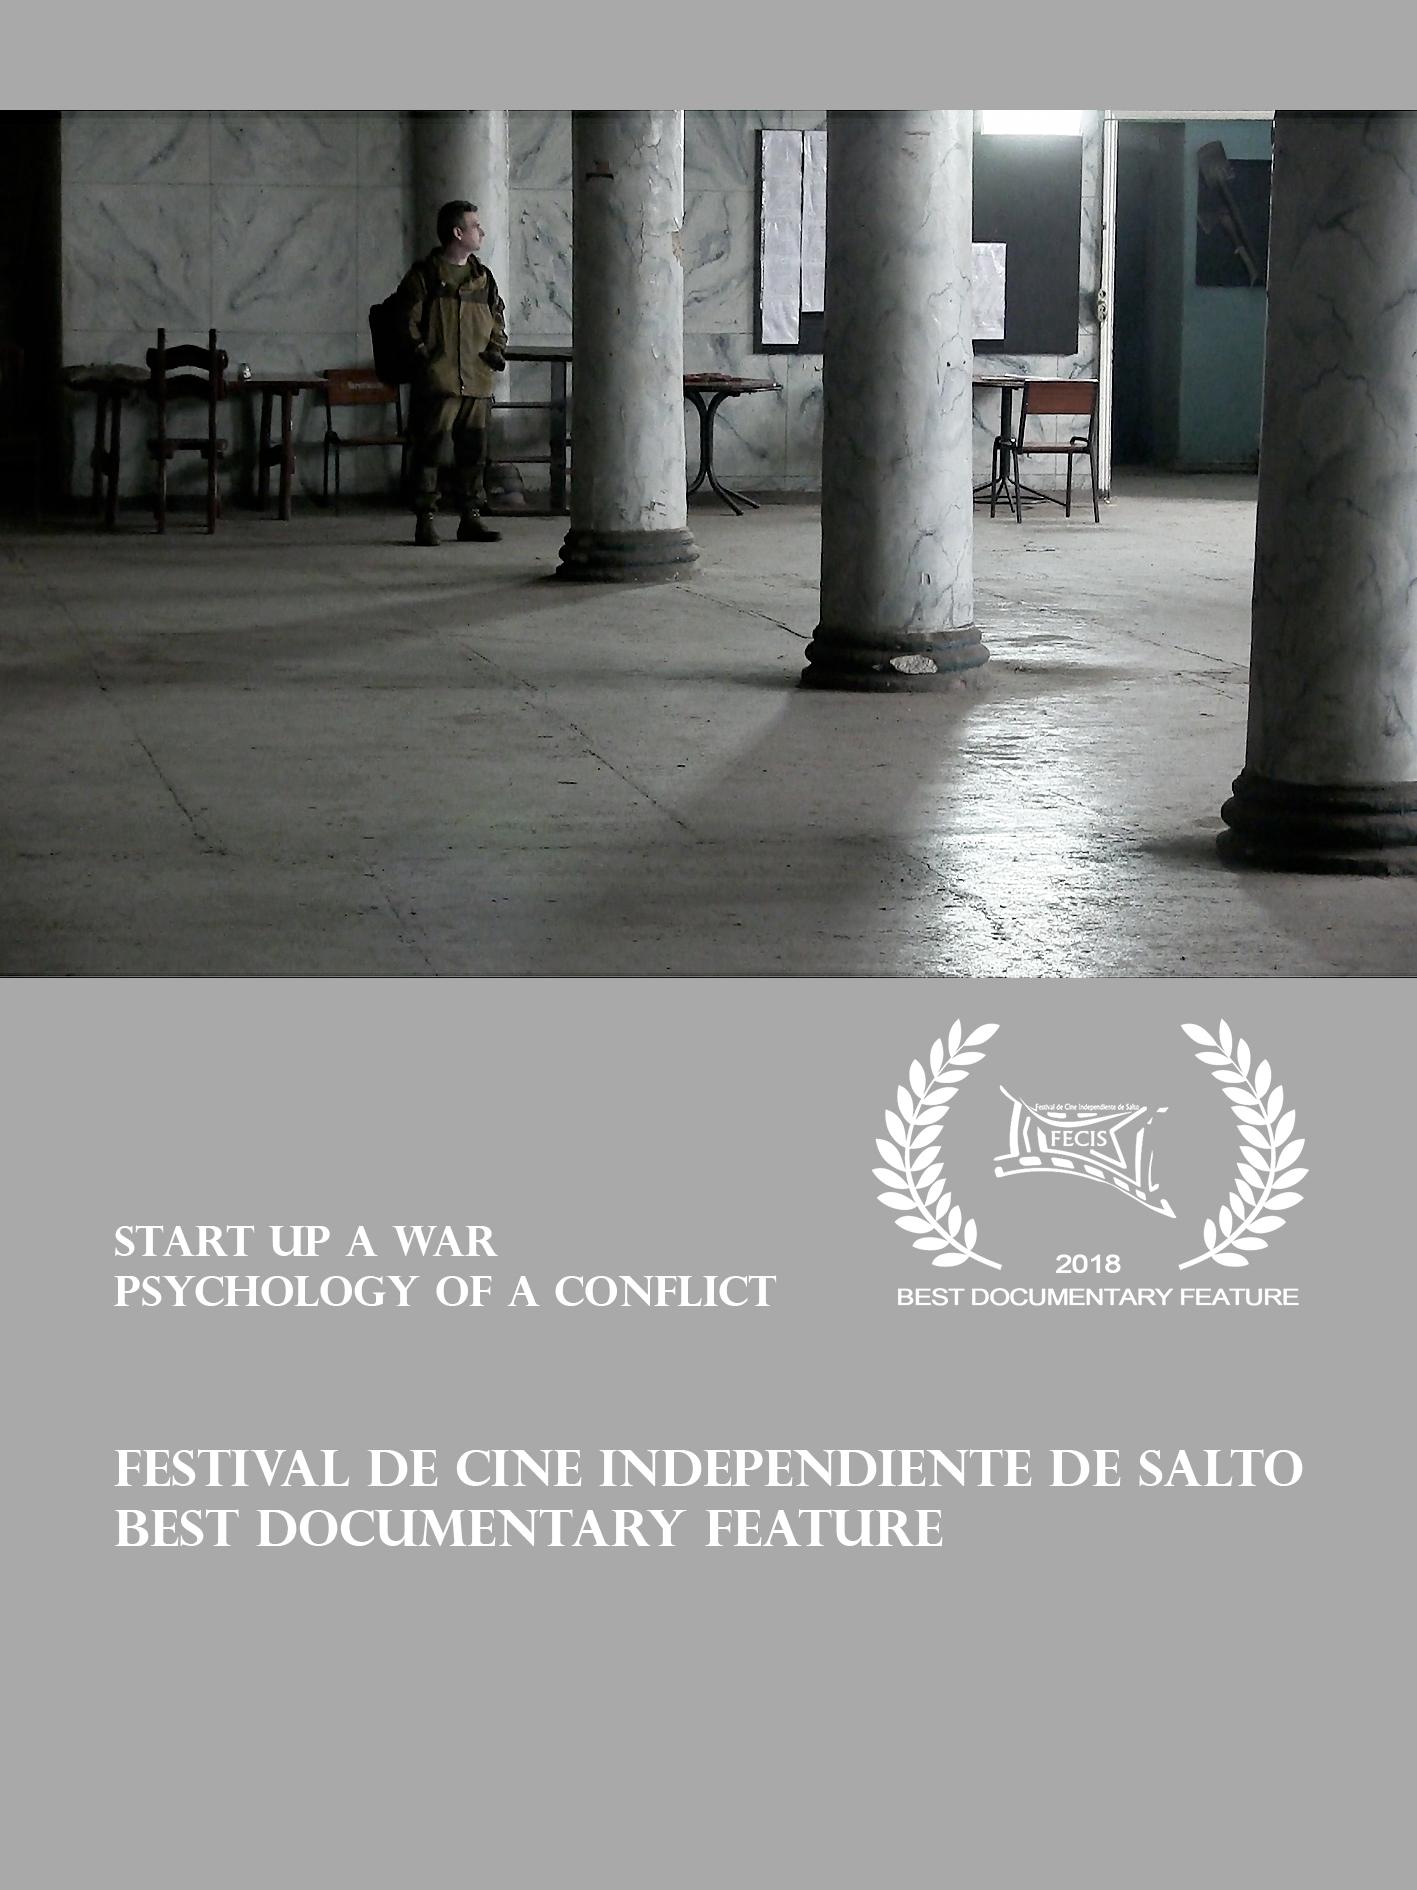 Sara Reginella | Start Up a War Festival de Cine Independente de Salto